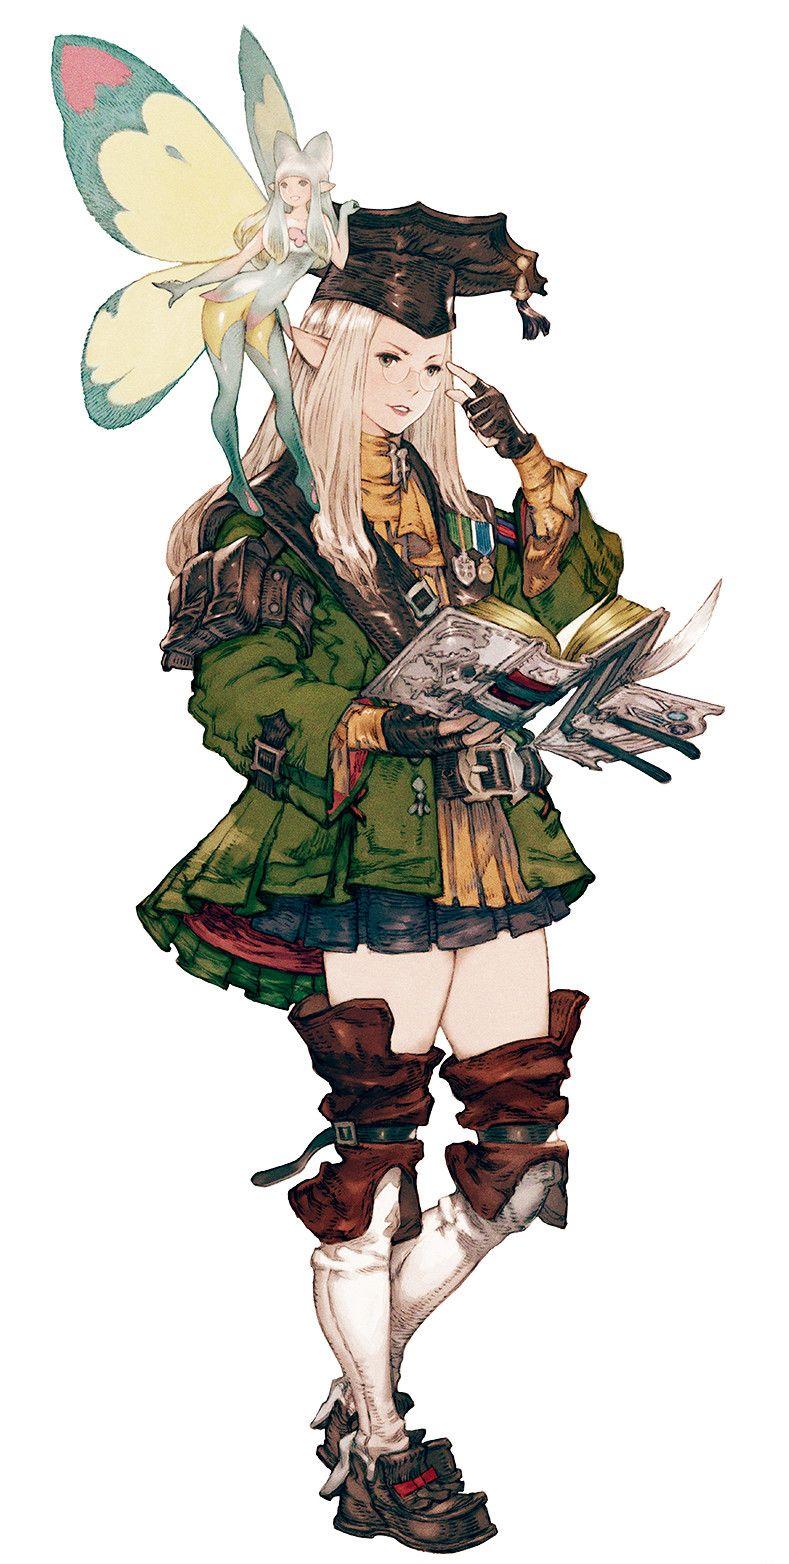 FFXIV Scholar and fairy | Final fantasy | Pinterest | RPG